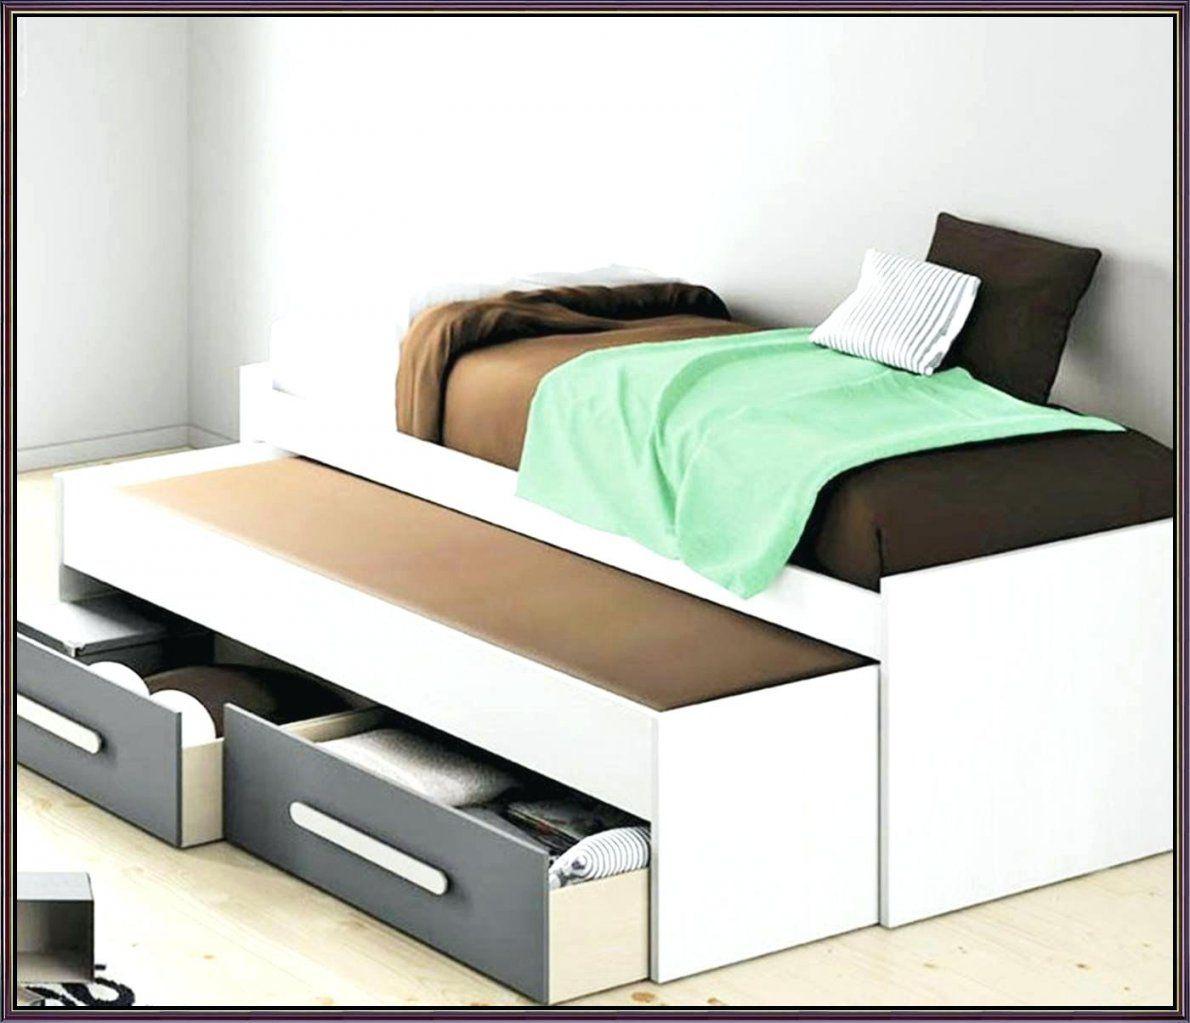 Bett Zum Ausziehen Bett Zum Ausziehen Mit Bettkasten Bett Zum von Bett Zum Ausziehen Auf Gleicher Höhe Bild